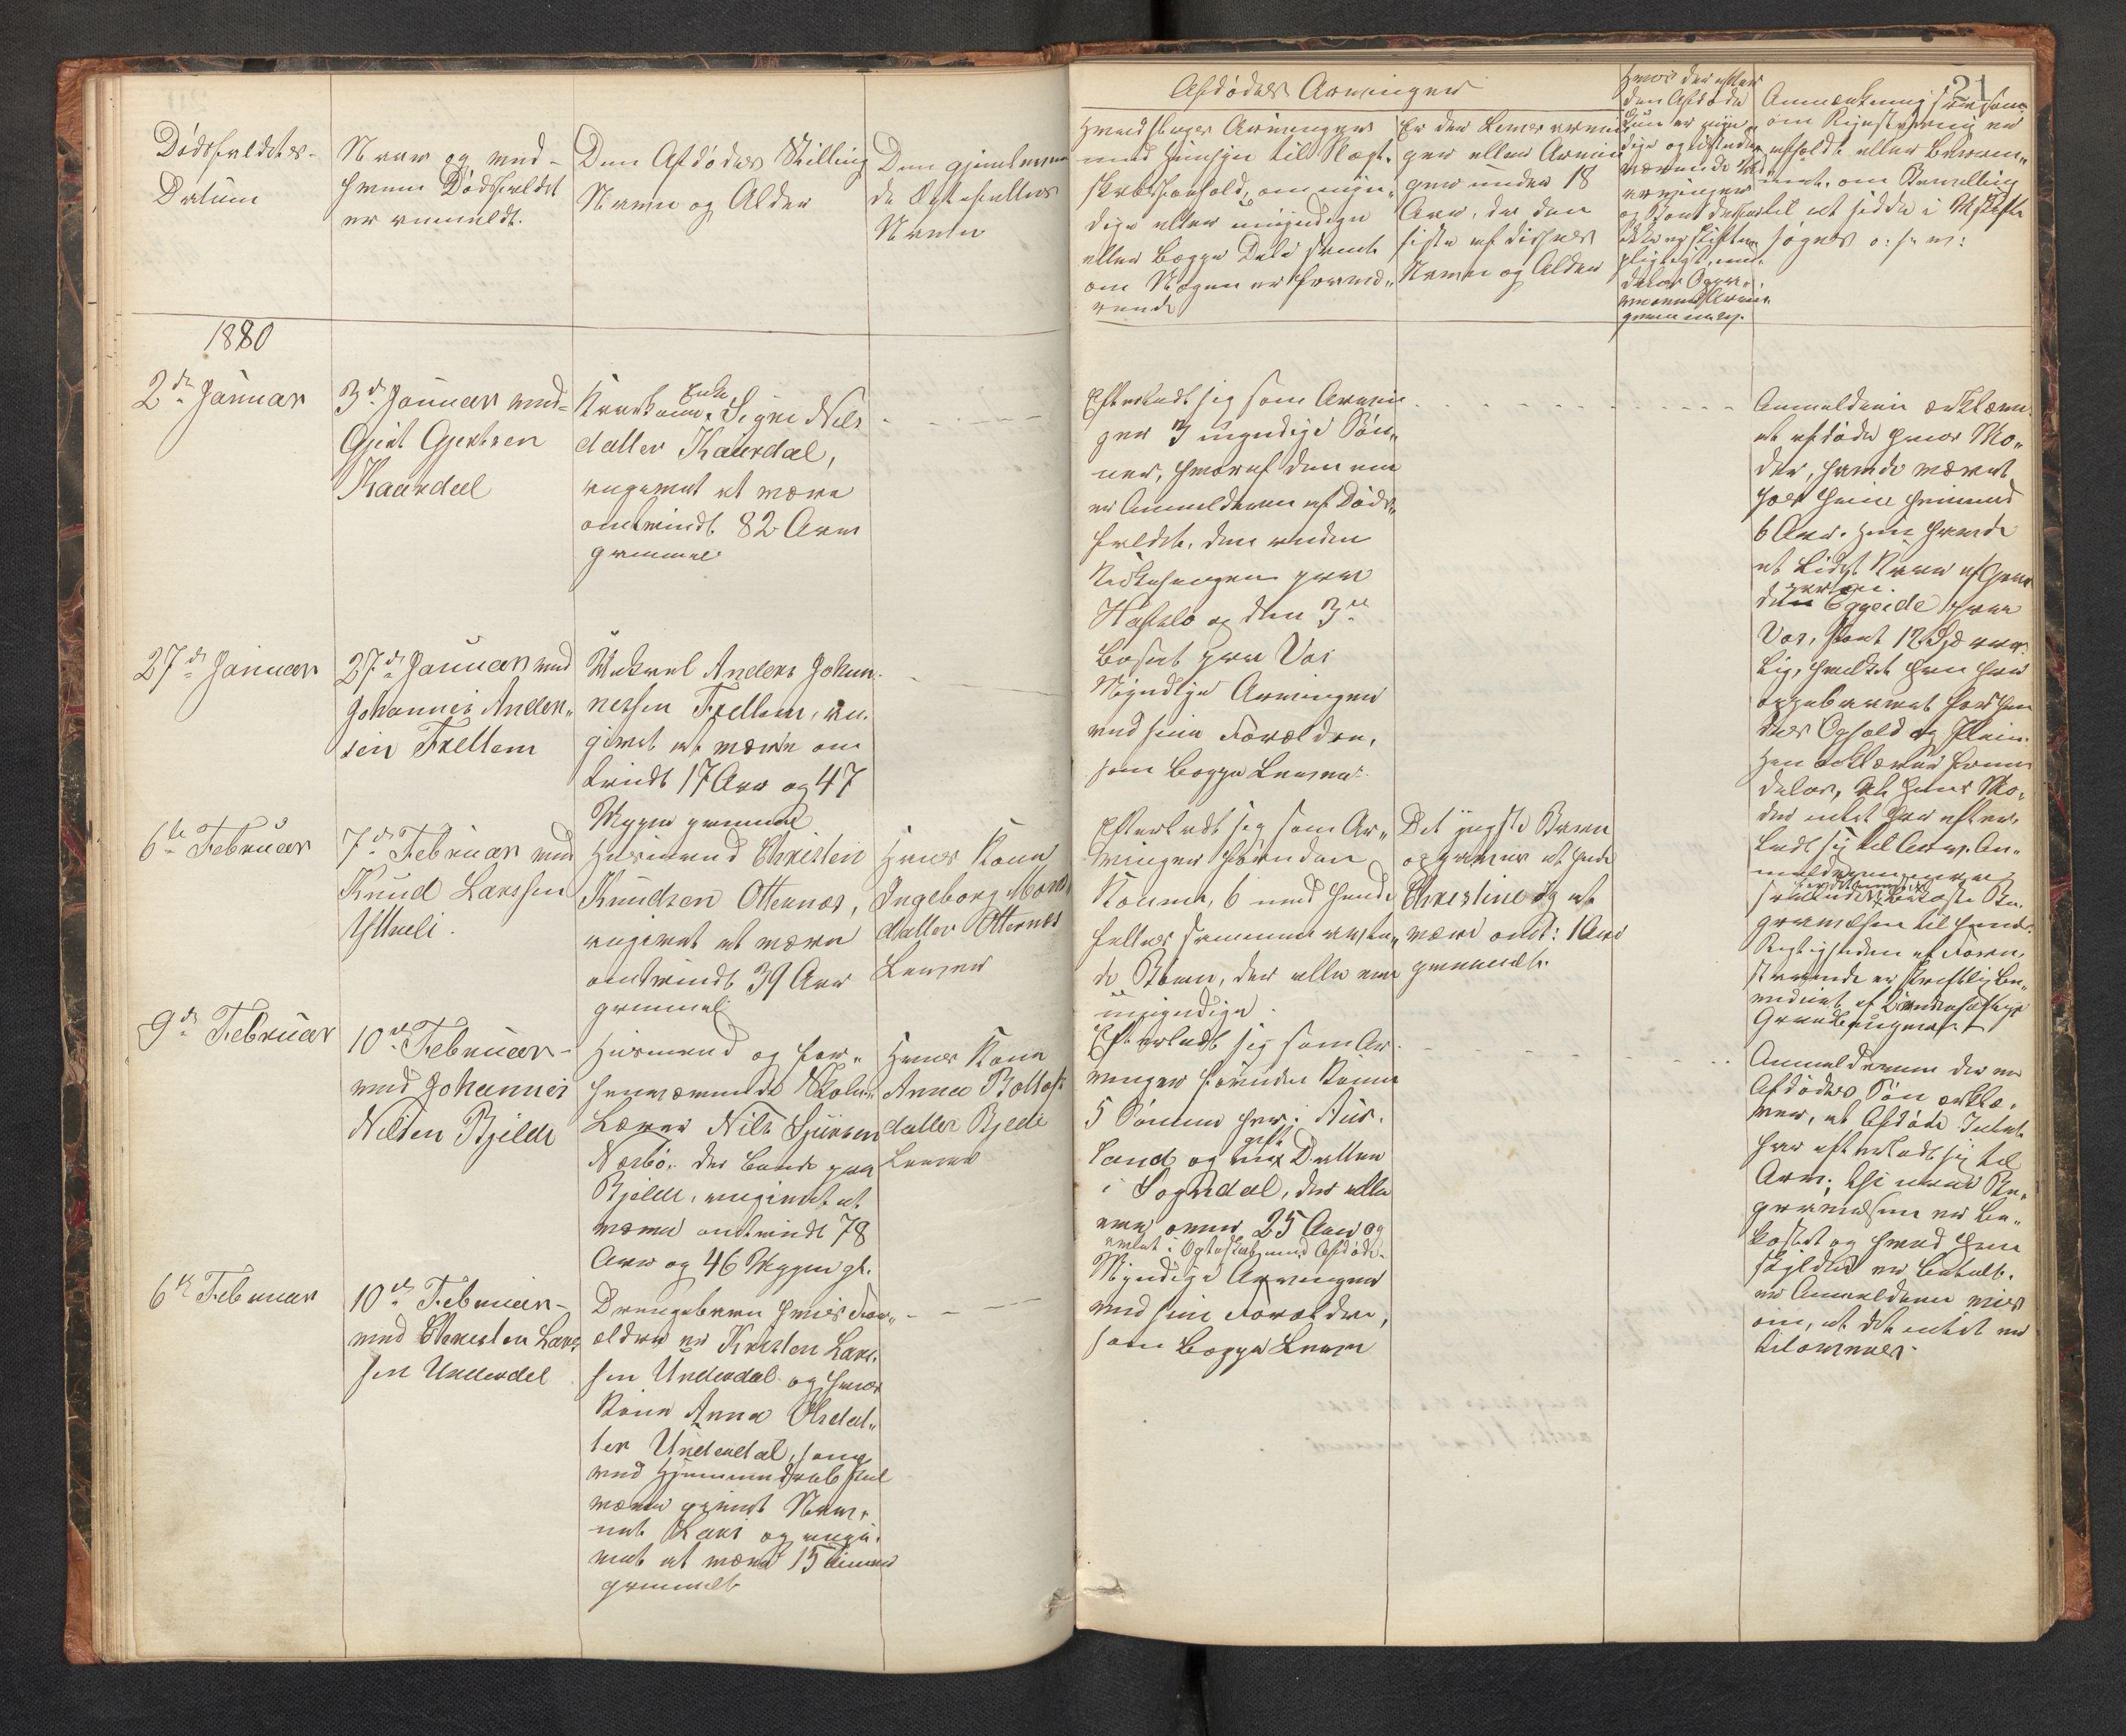 SAB, Lensmannen i Aurland, 0006/L0002: Dødsfallprotokoll, 1877-1892, s. 20b-21a